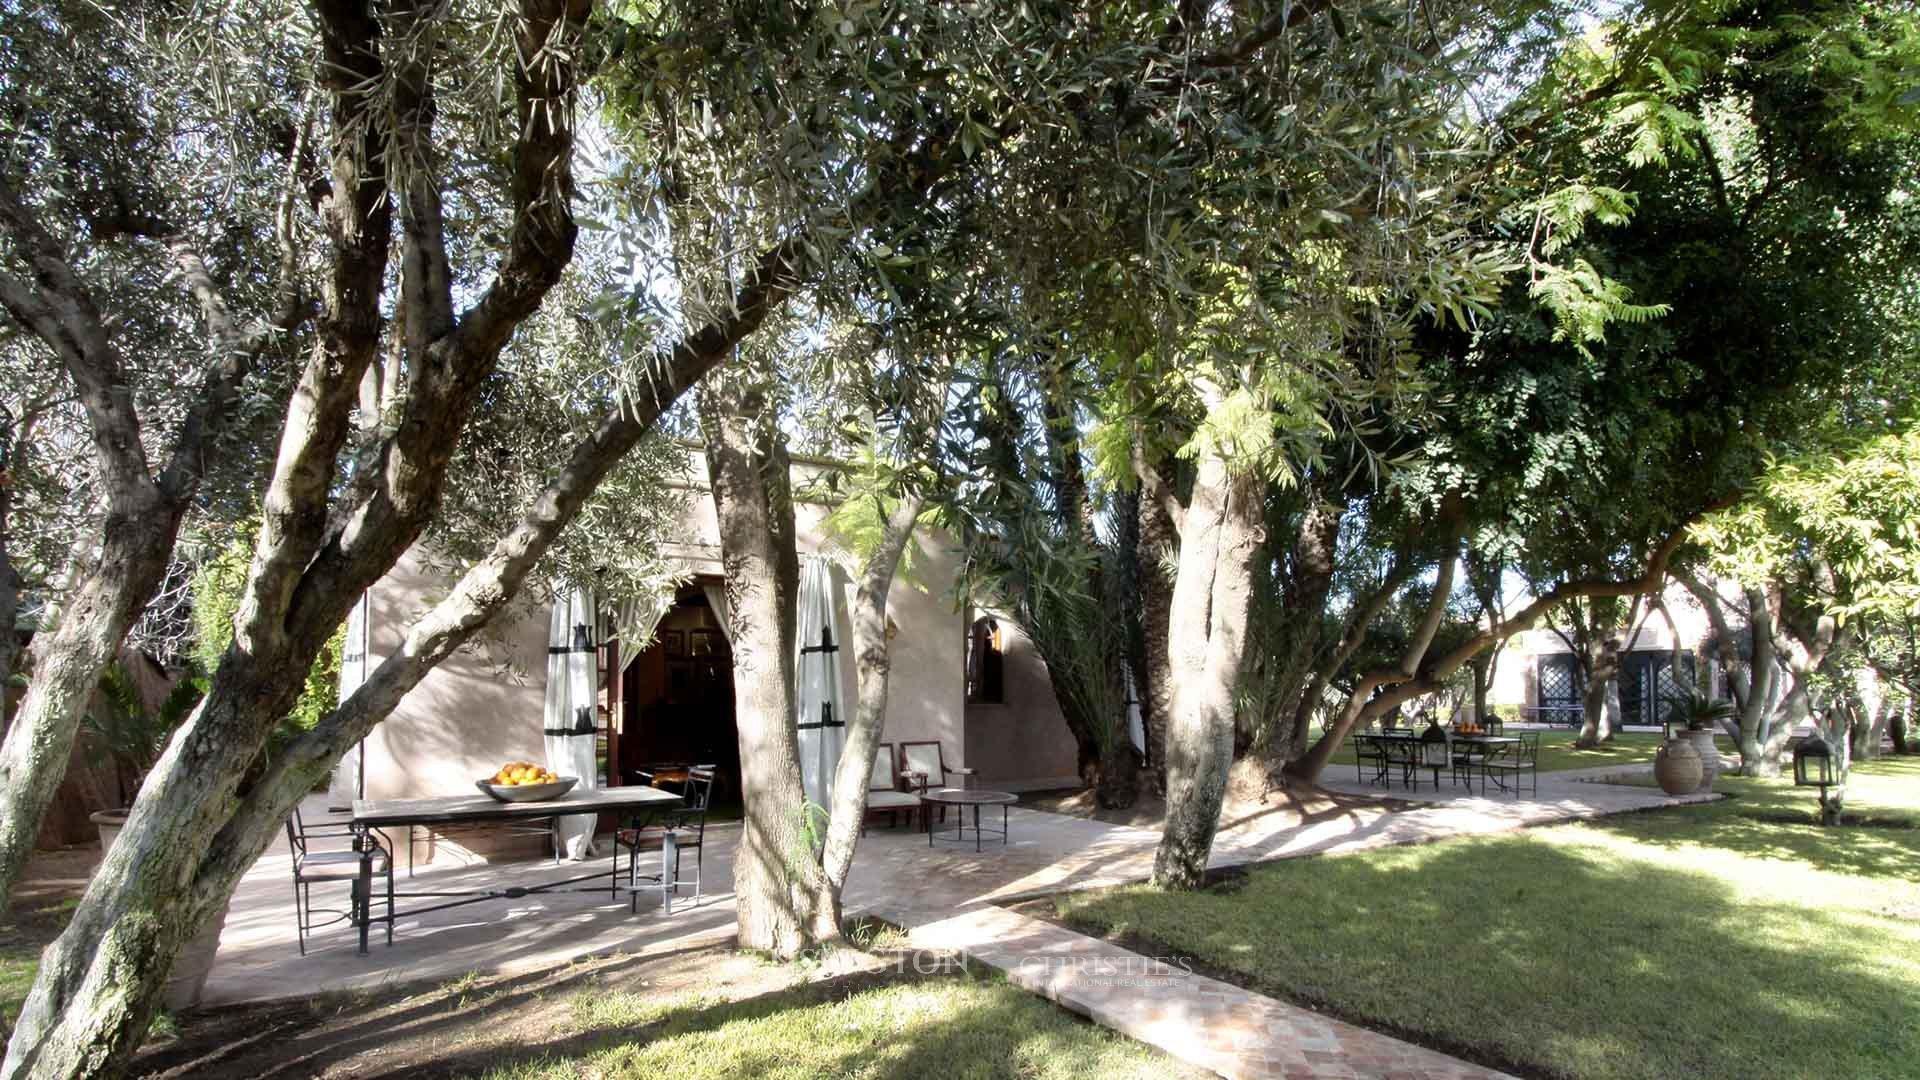 KPPM01006: Villa Ezzar Luxury Villa Marrakech Morocco